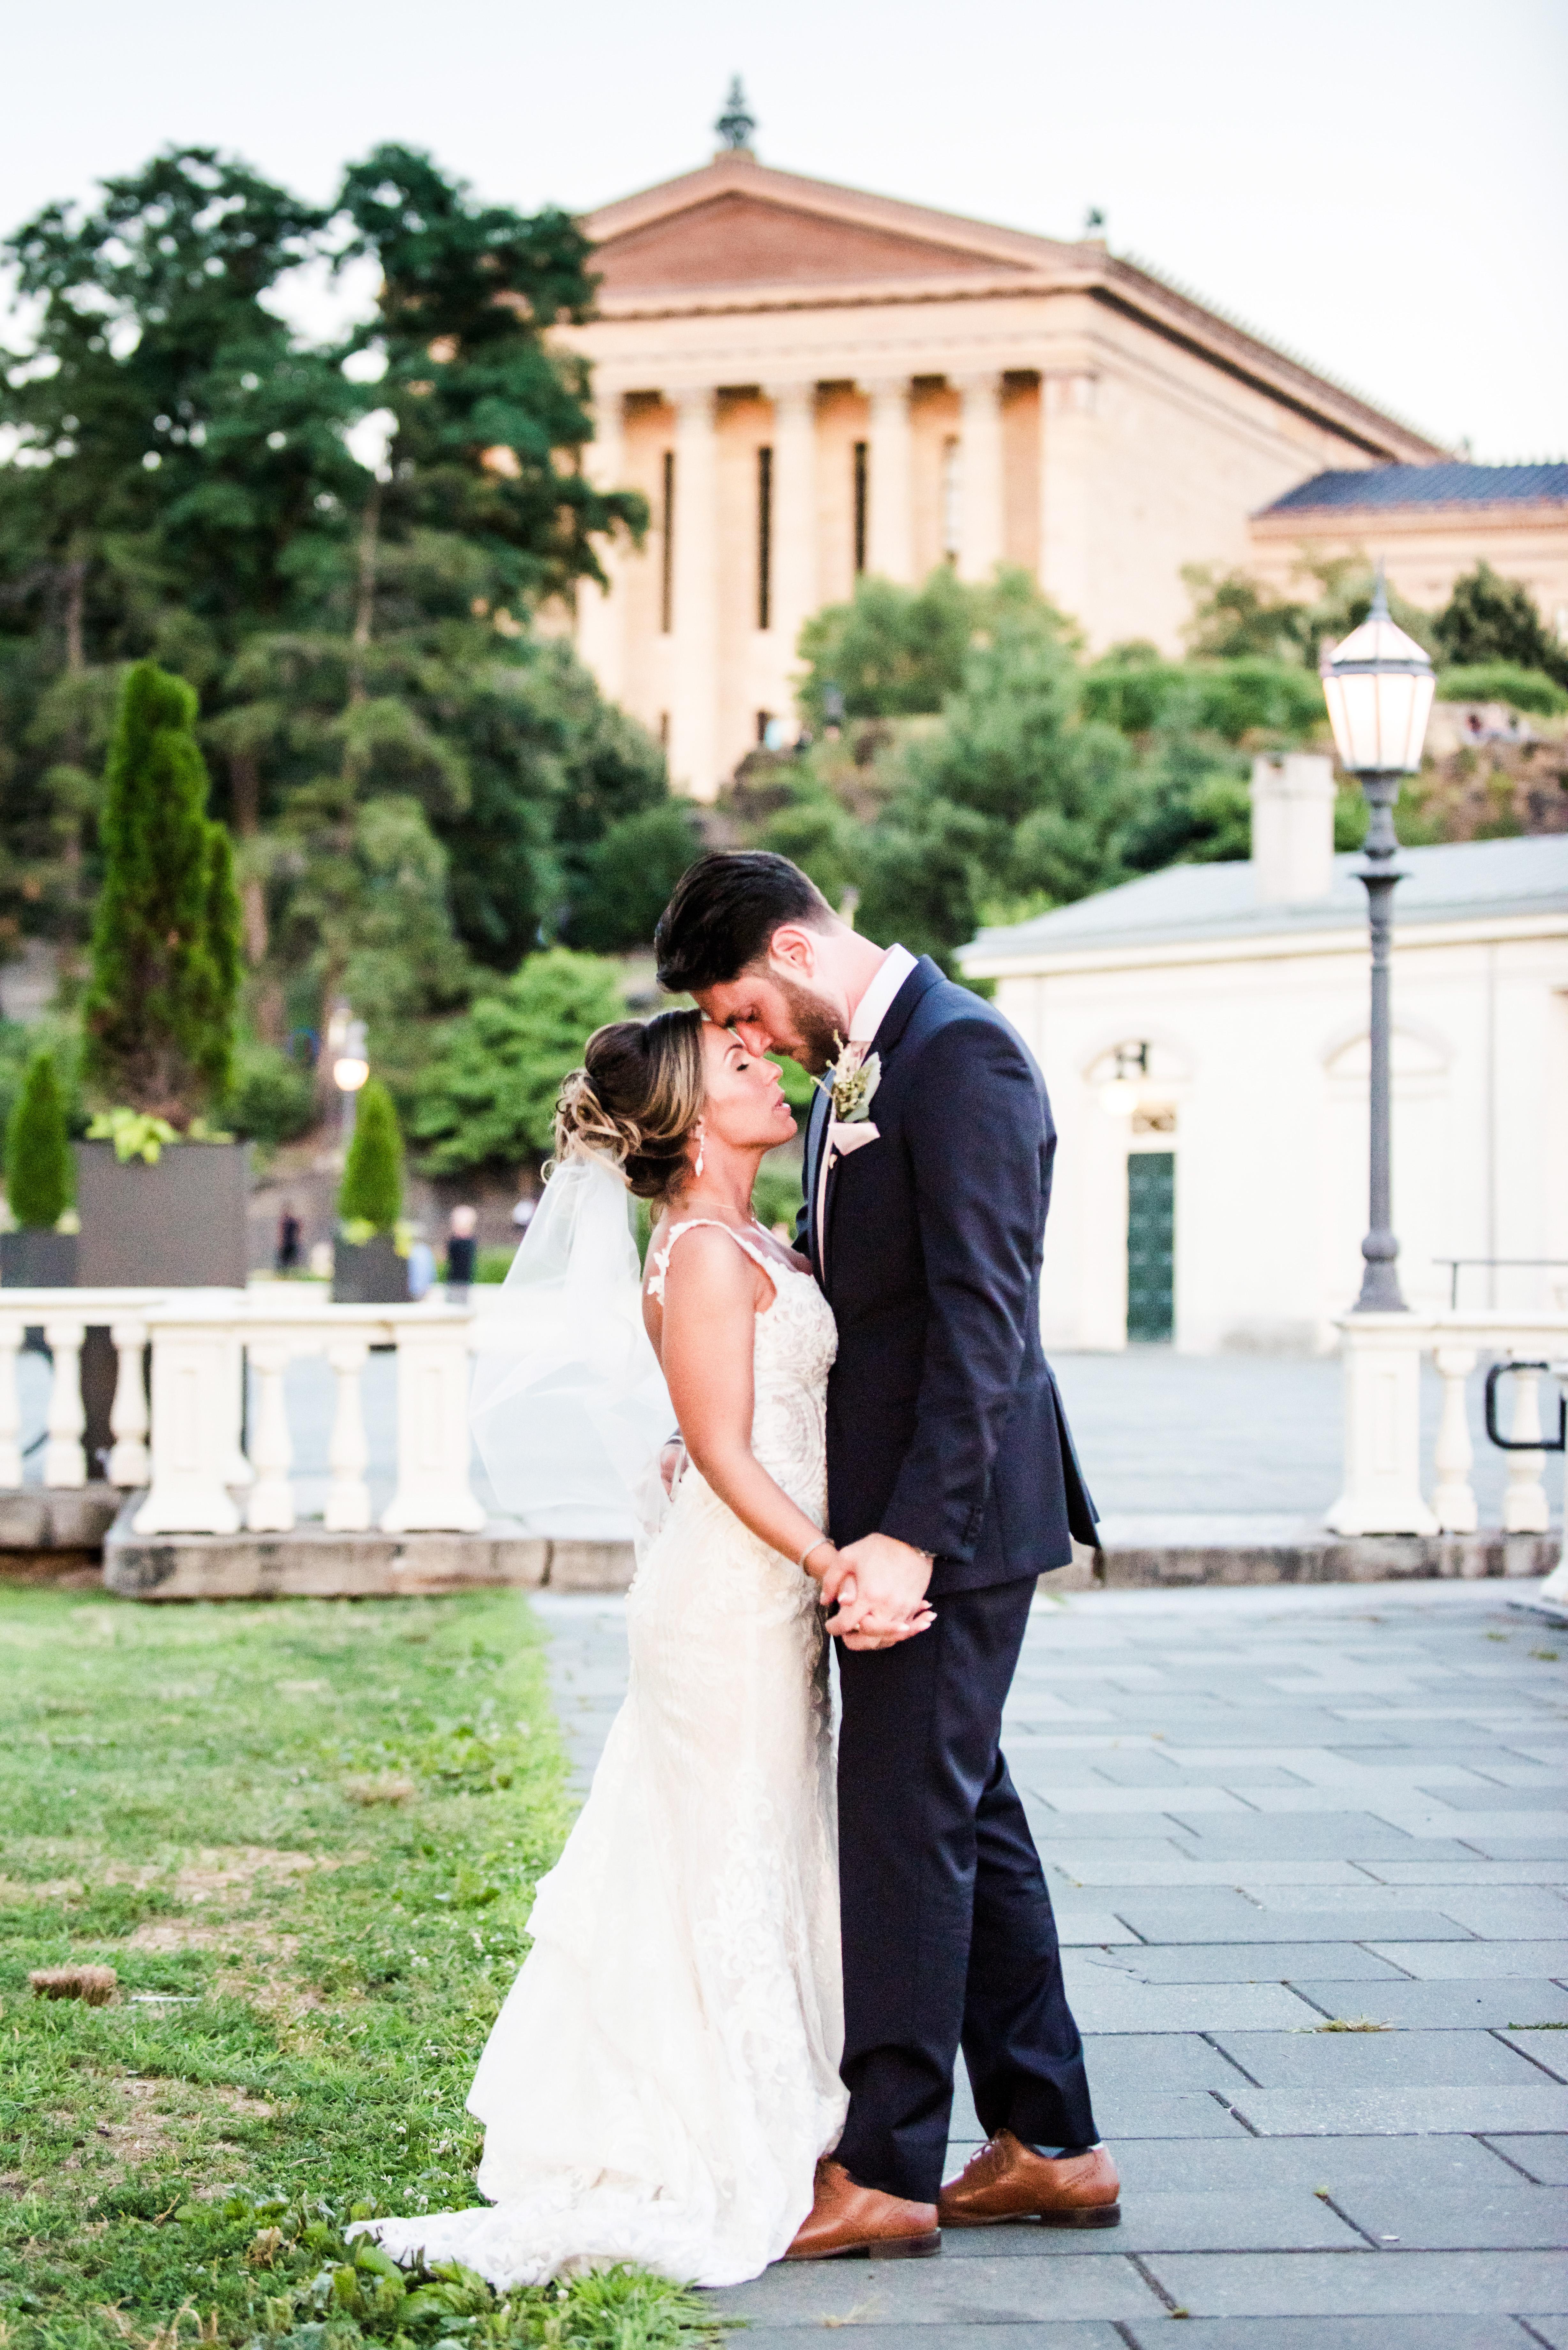 Nicole-Chris-Wedding-Andrea-Krout-Photog